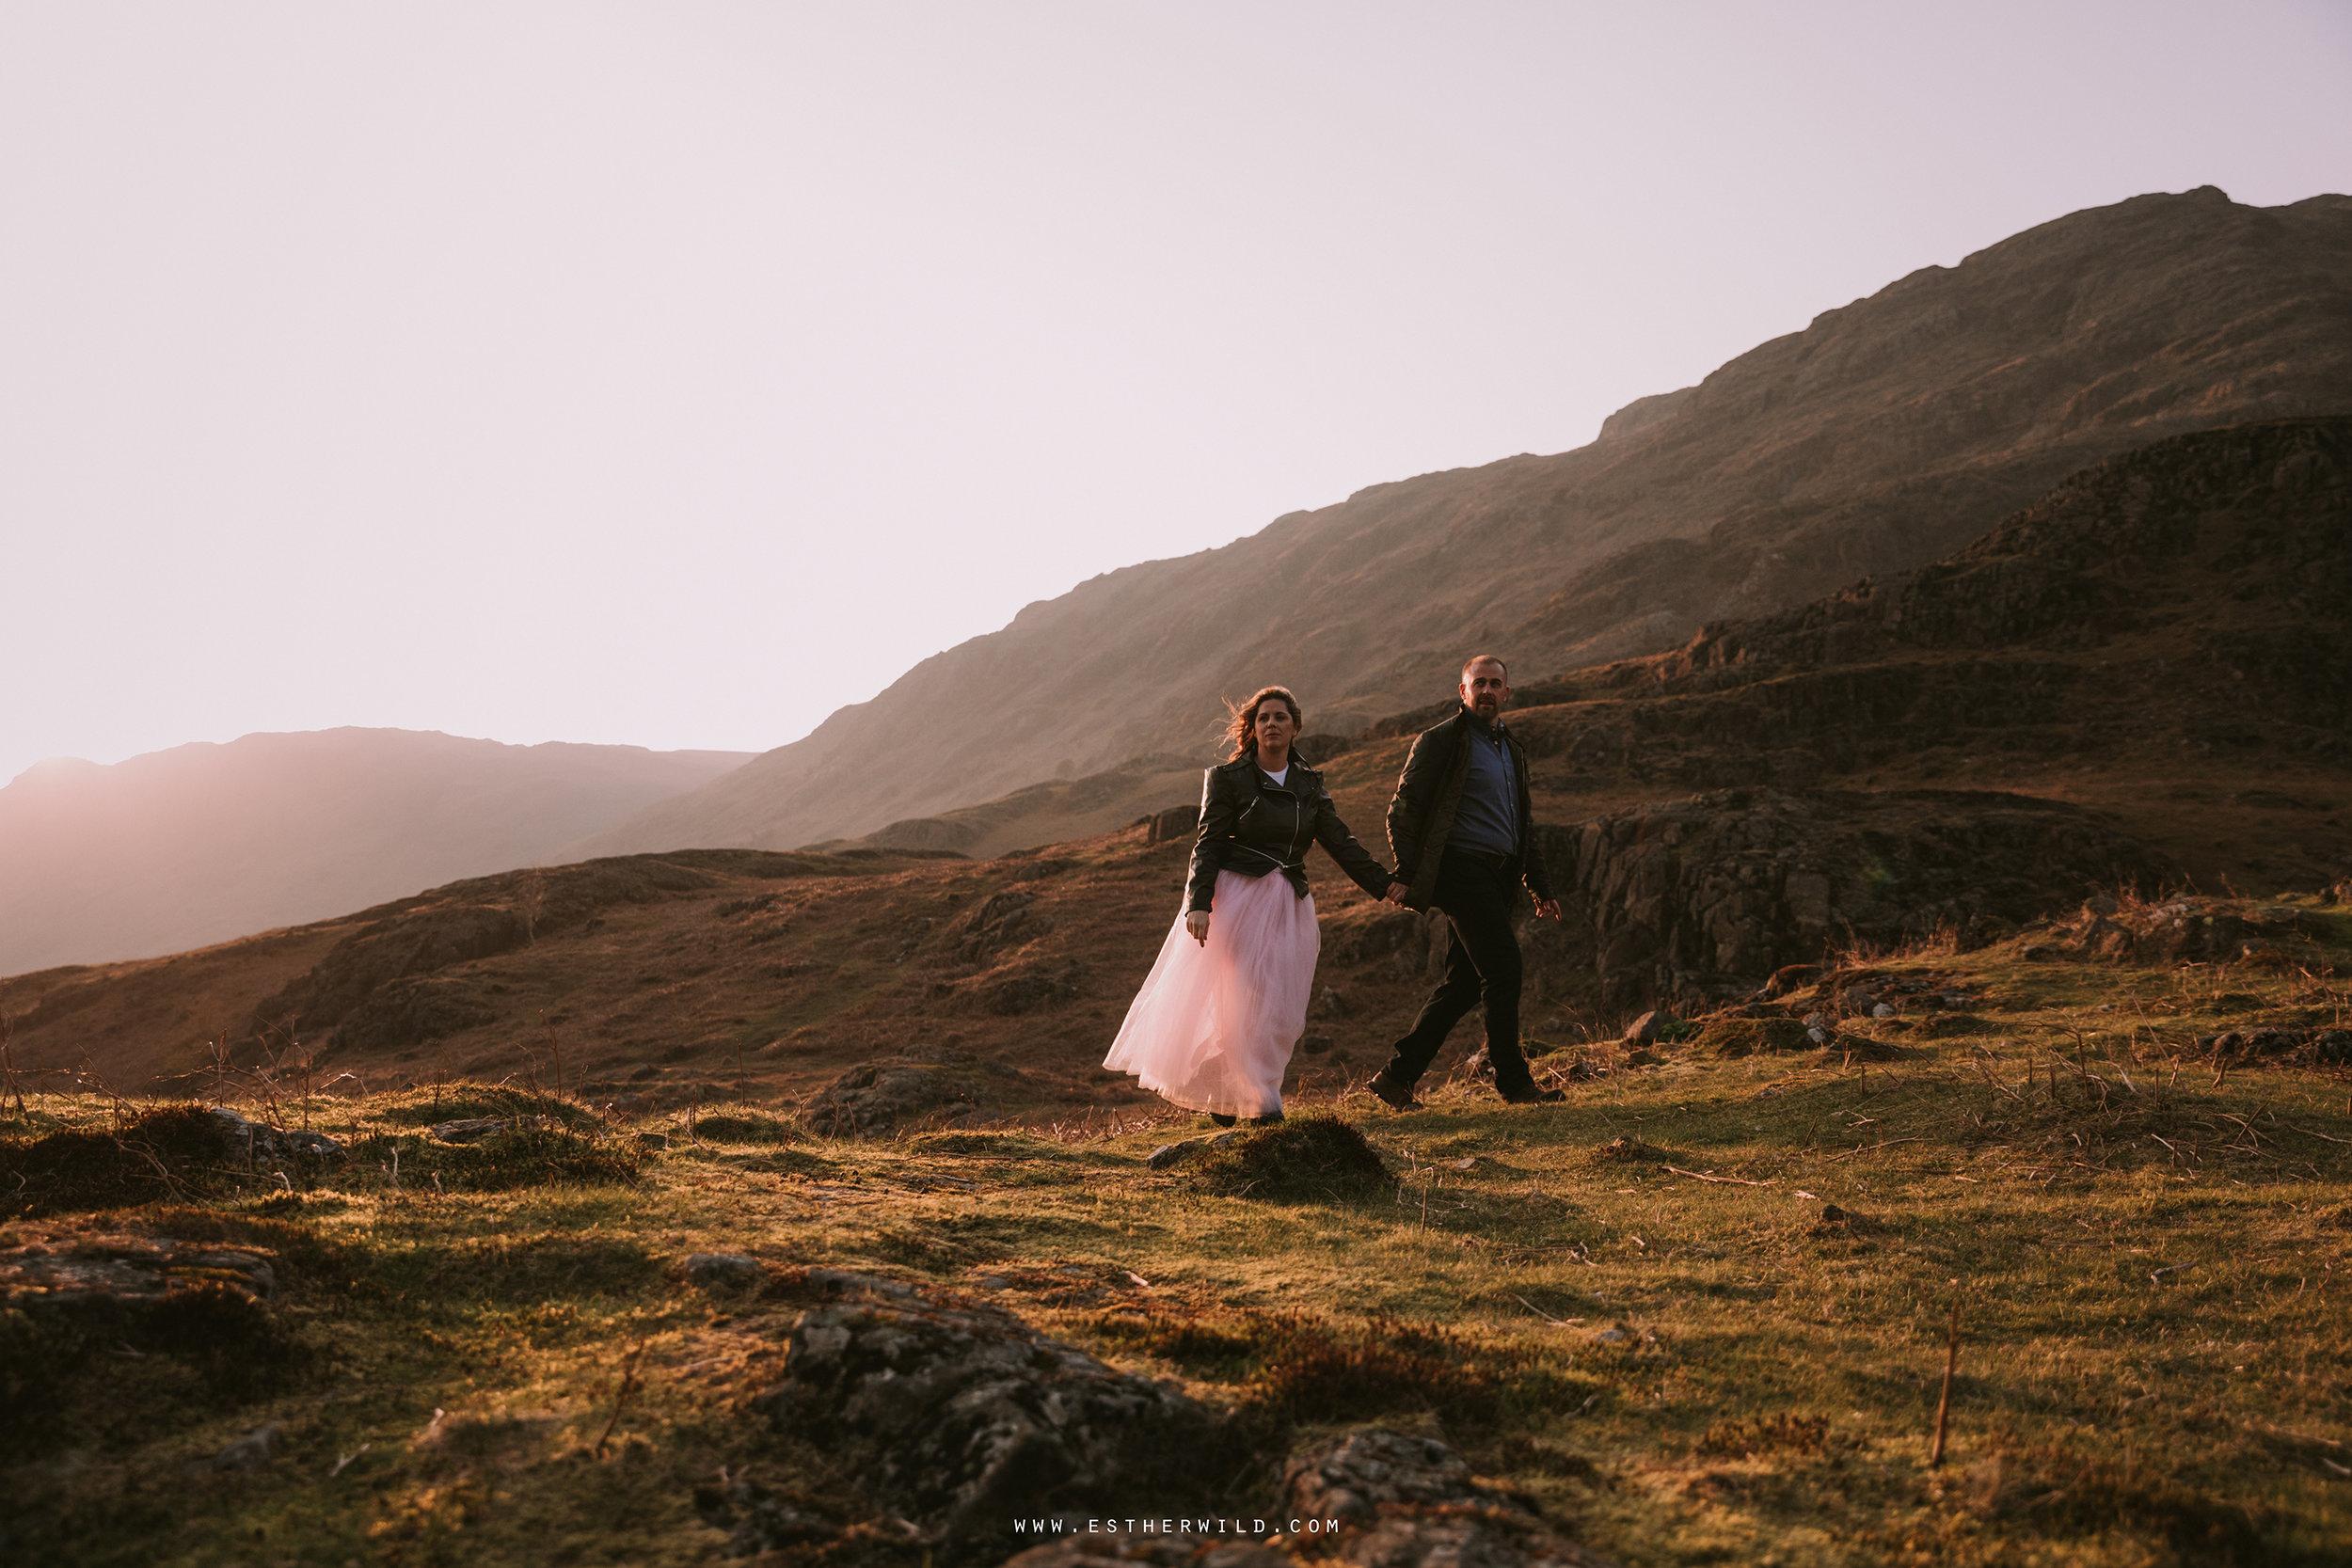 Cumbria_Lake_District_Wasdale_Wedding_Photographer_Destination_Engagement_Anniversary_Esther_Wild_IMG_4484.jpg